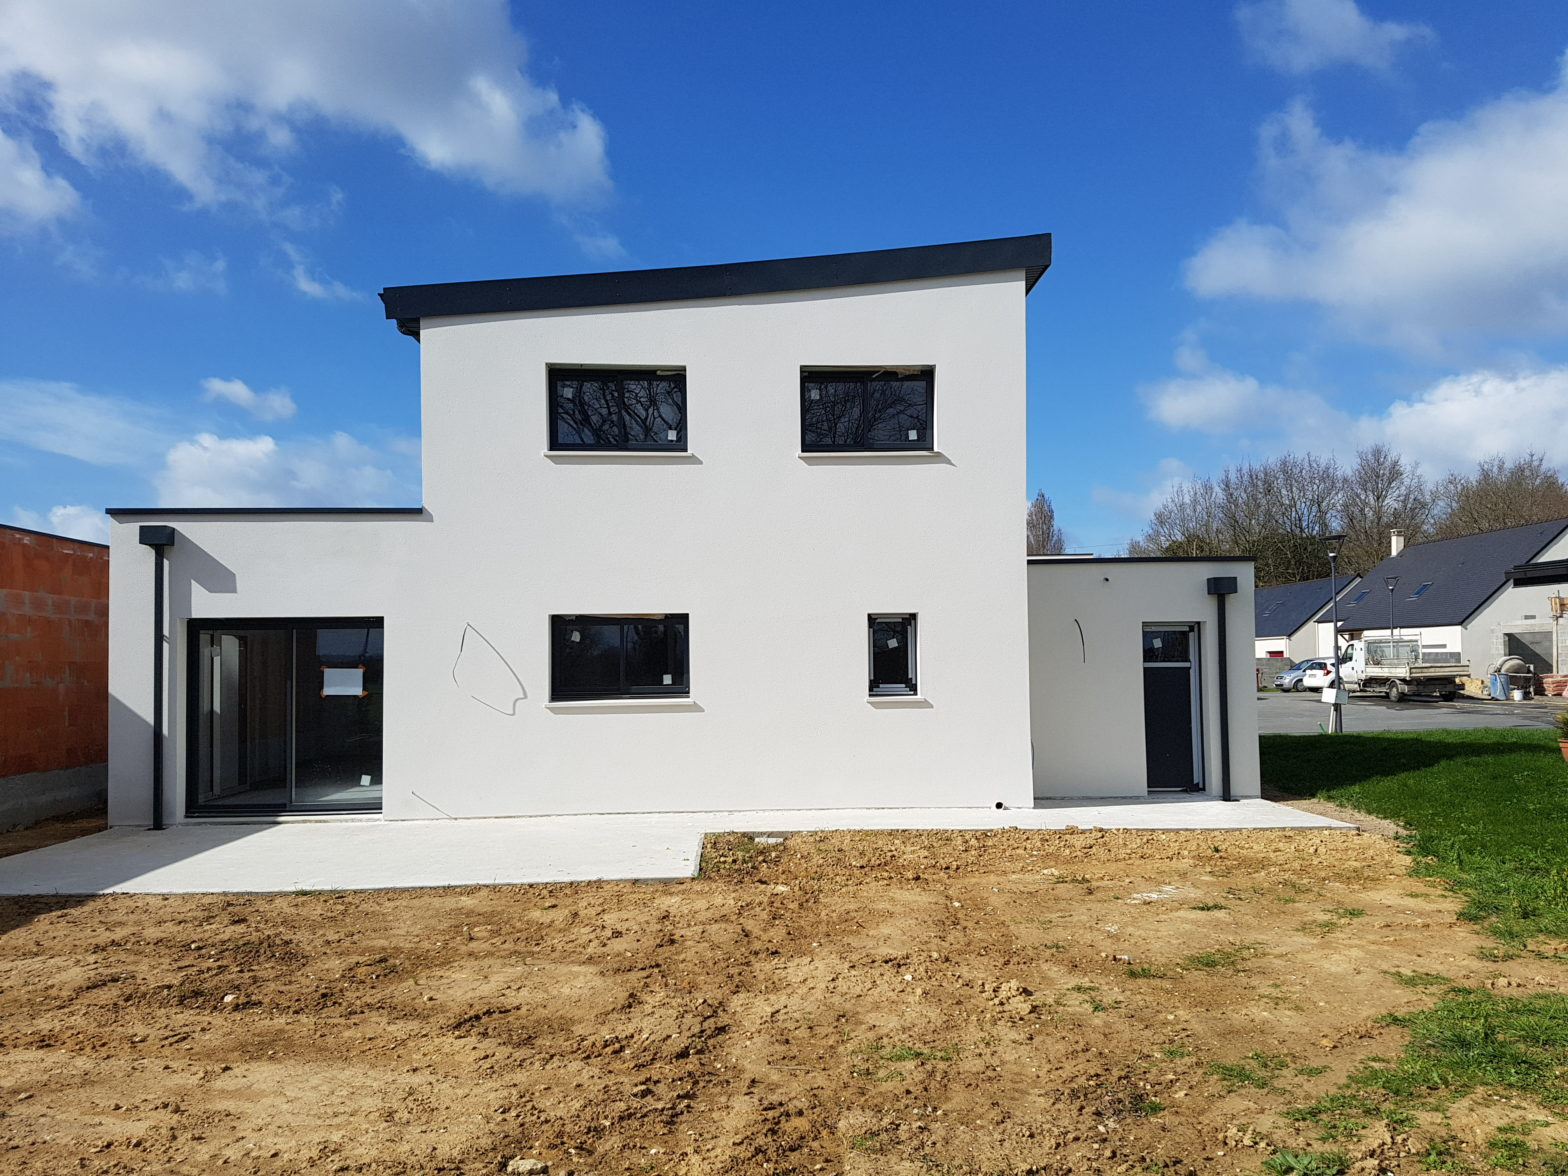 maison etage r+1 toit monopente 49220 grez neuville